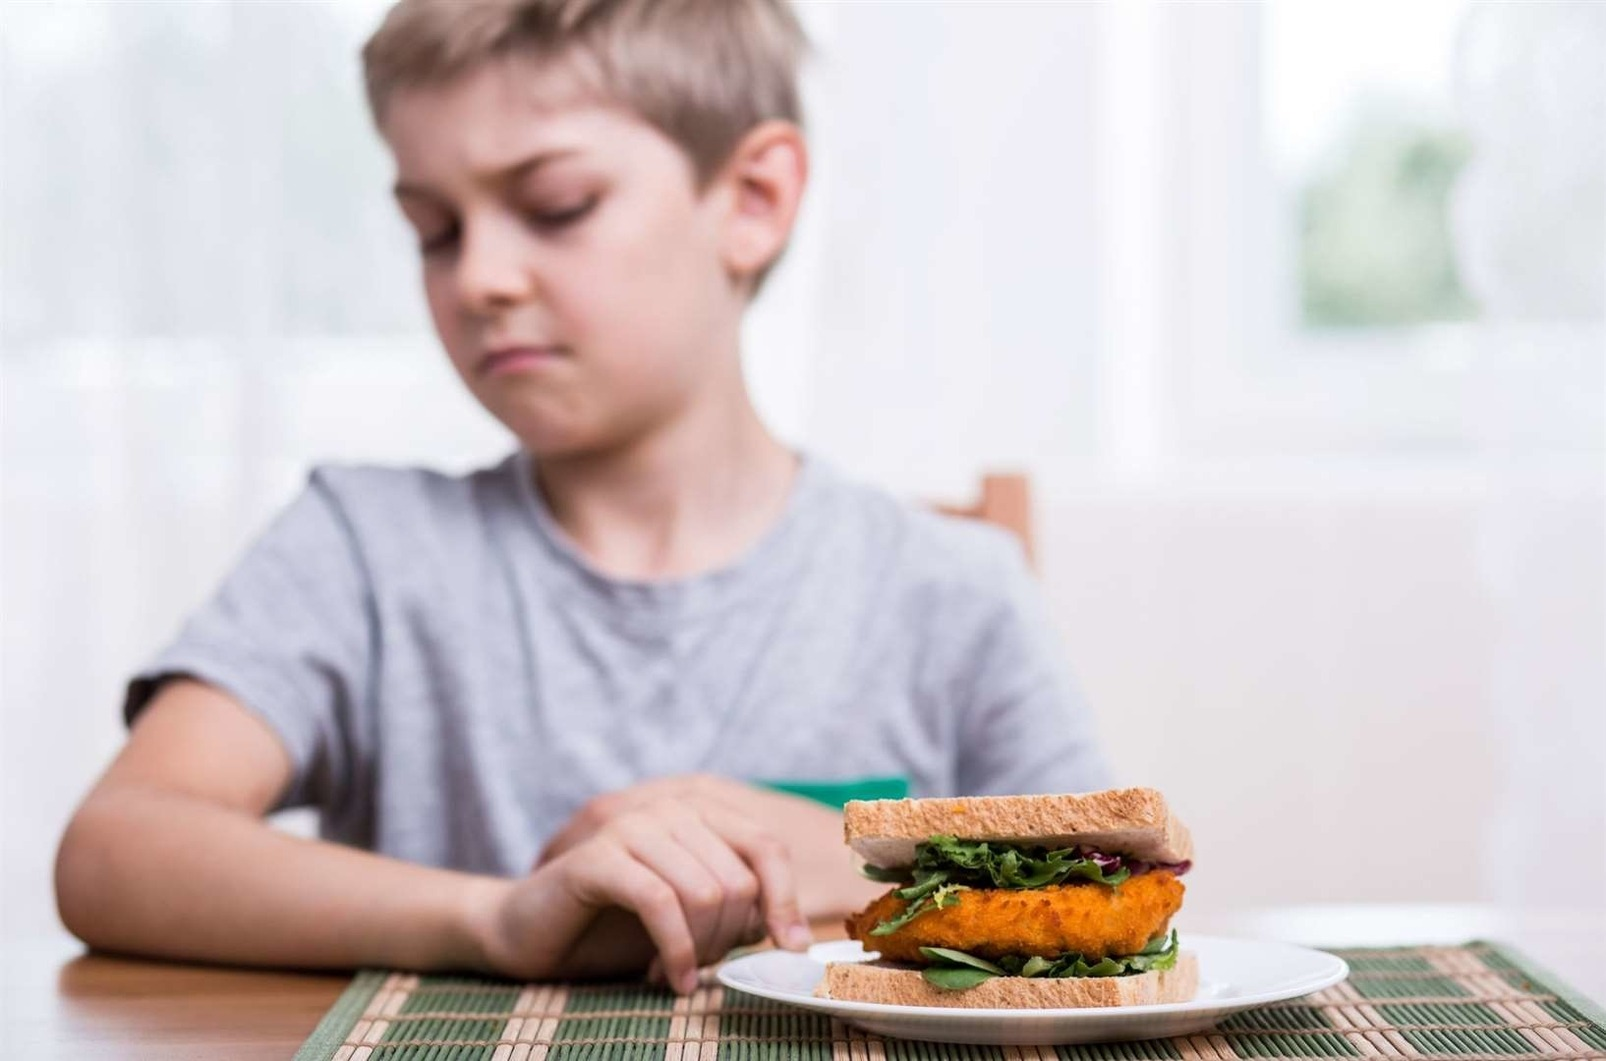 Food Refusal & Avoidance in Children